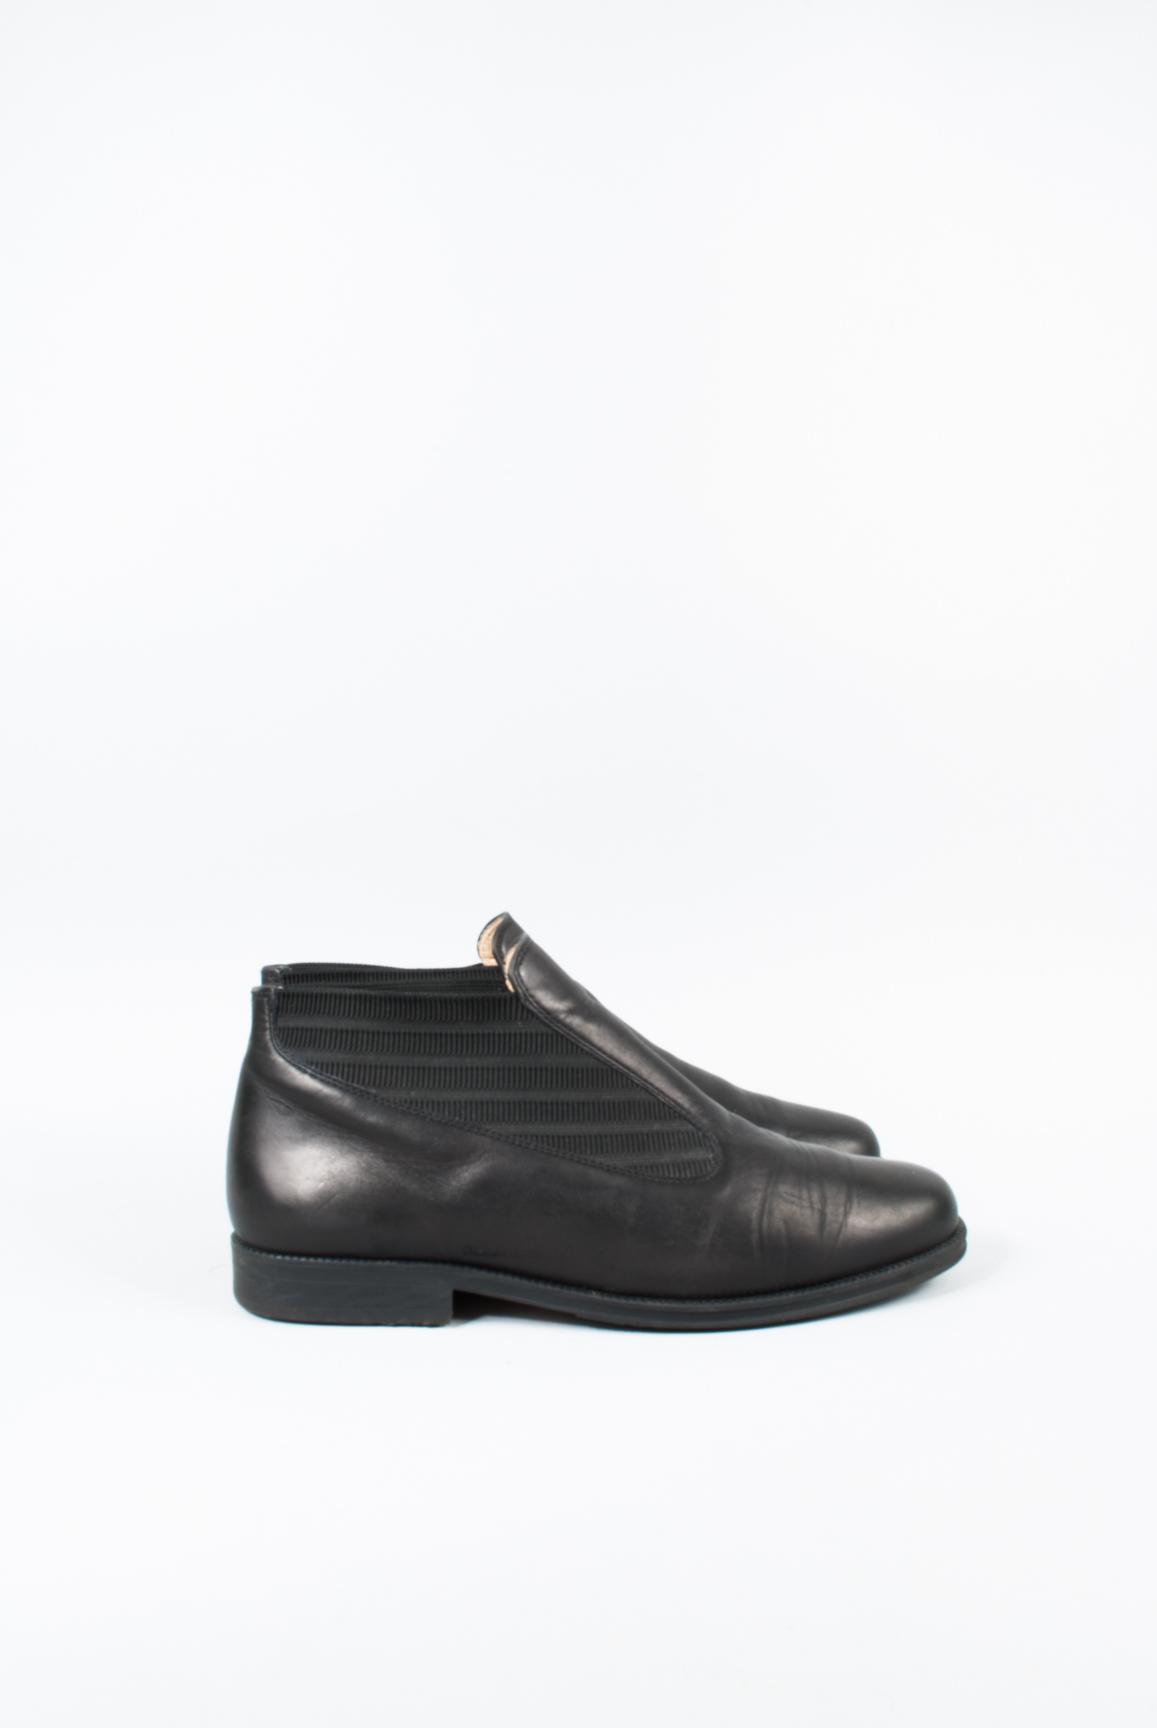 huge selection of ece28 071e6 Vintage Schuhe -Flair- von Ara in schwarz aus Leder- 90er ...